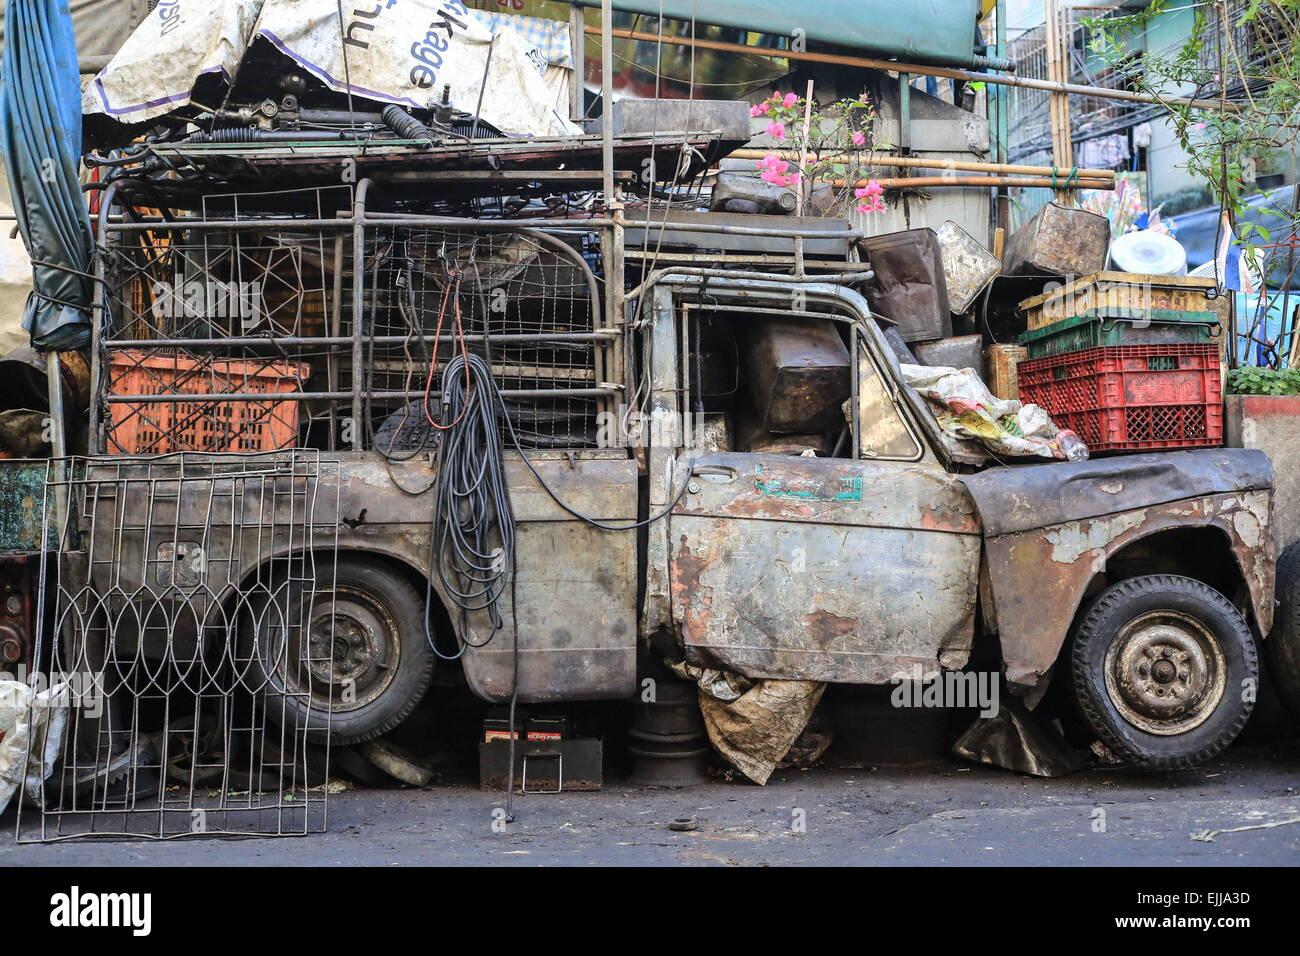 Feb 25, 2015 - Bangkok, Thailand - Old car parked on the street ...